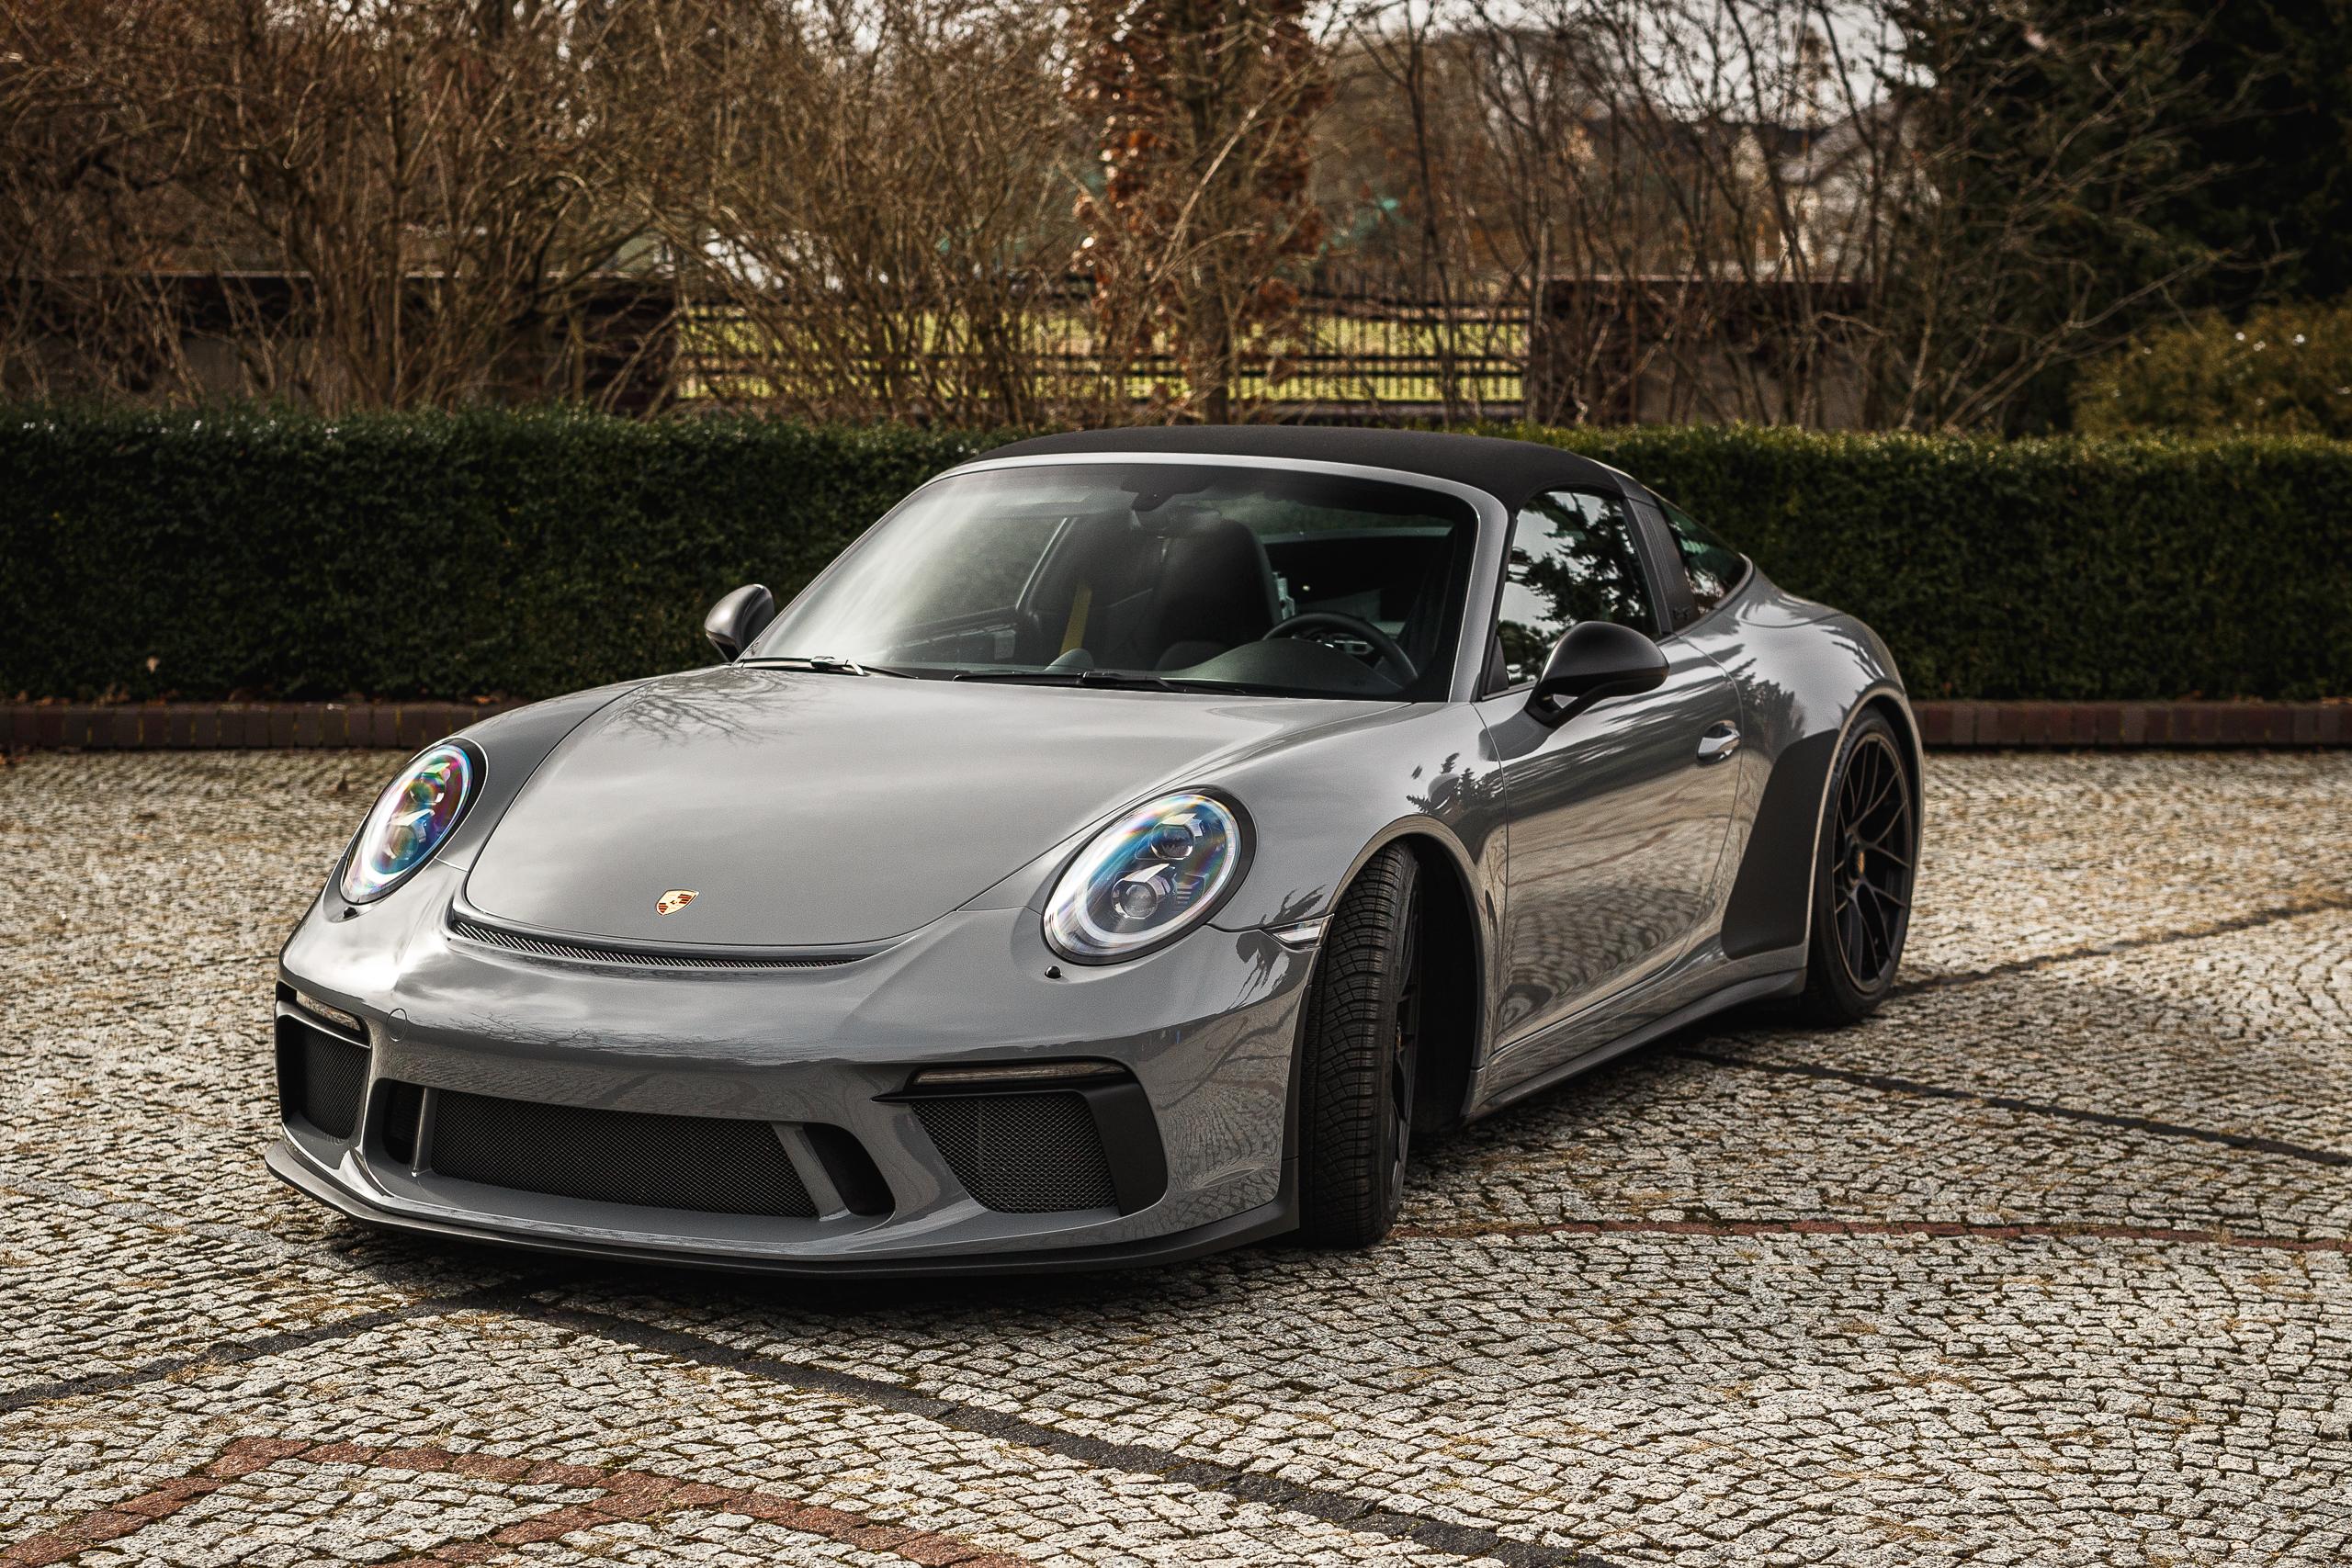 04 NeedForWraps - PCC - Gloss Grey Porsche 911GTS - HQ - PSU